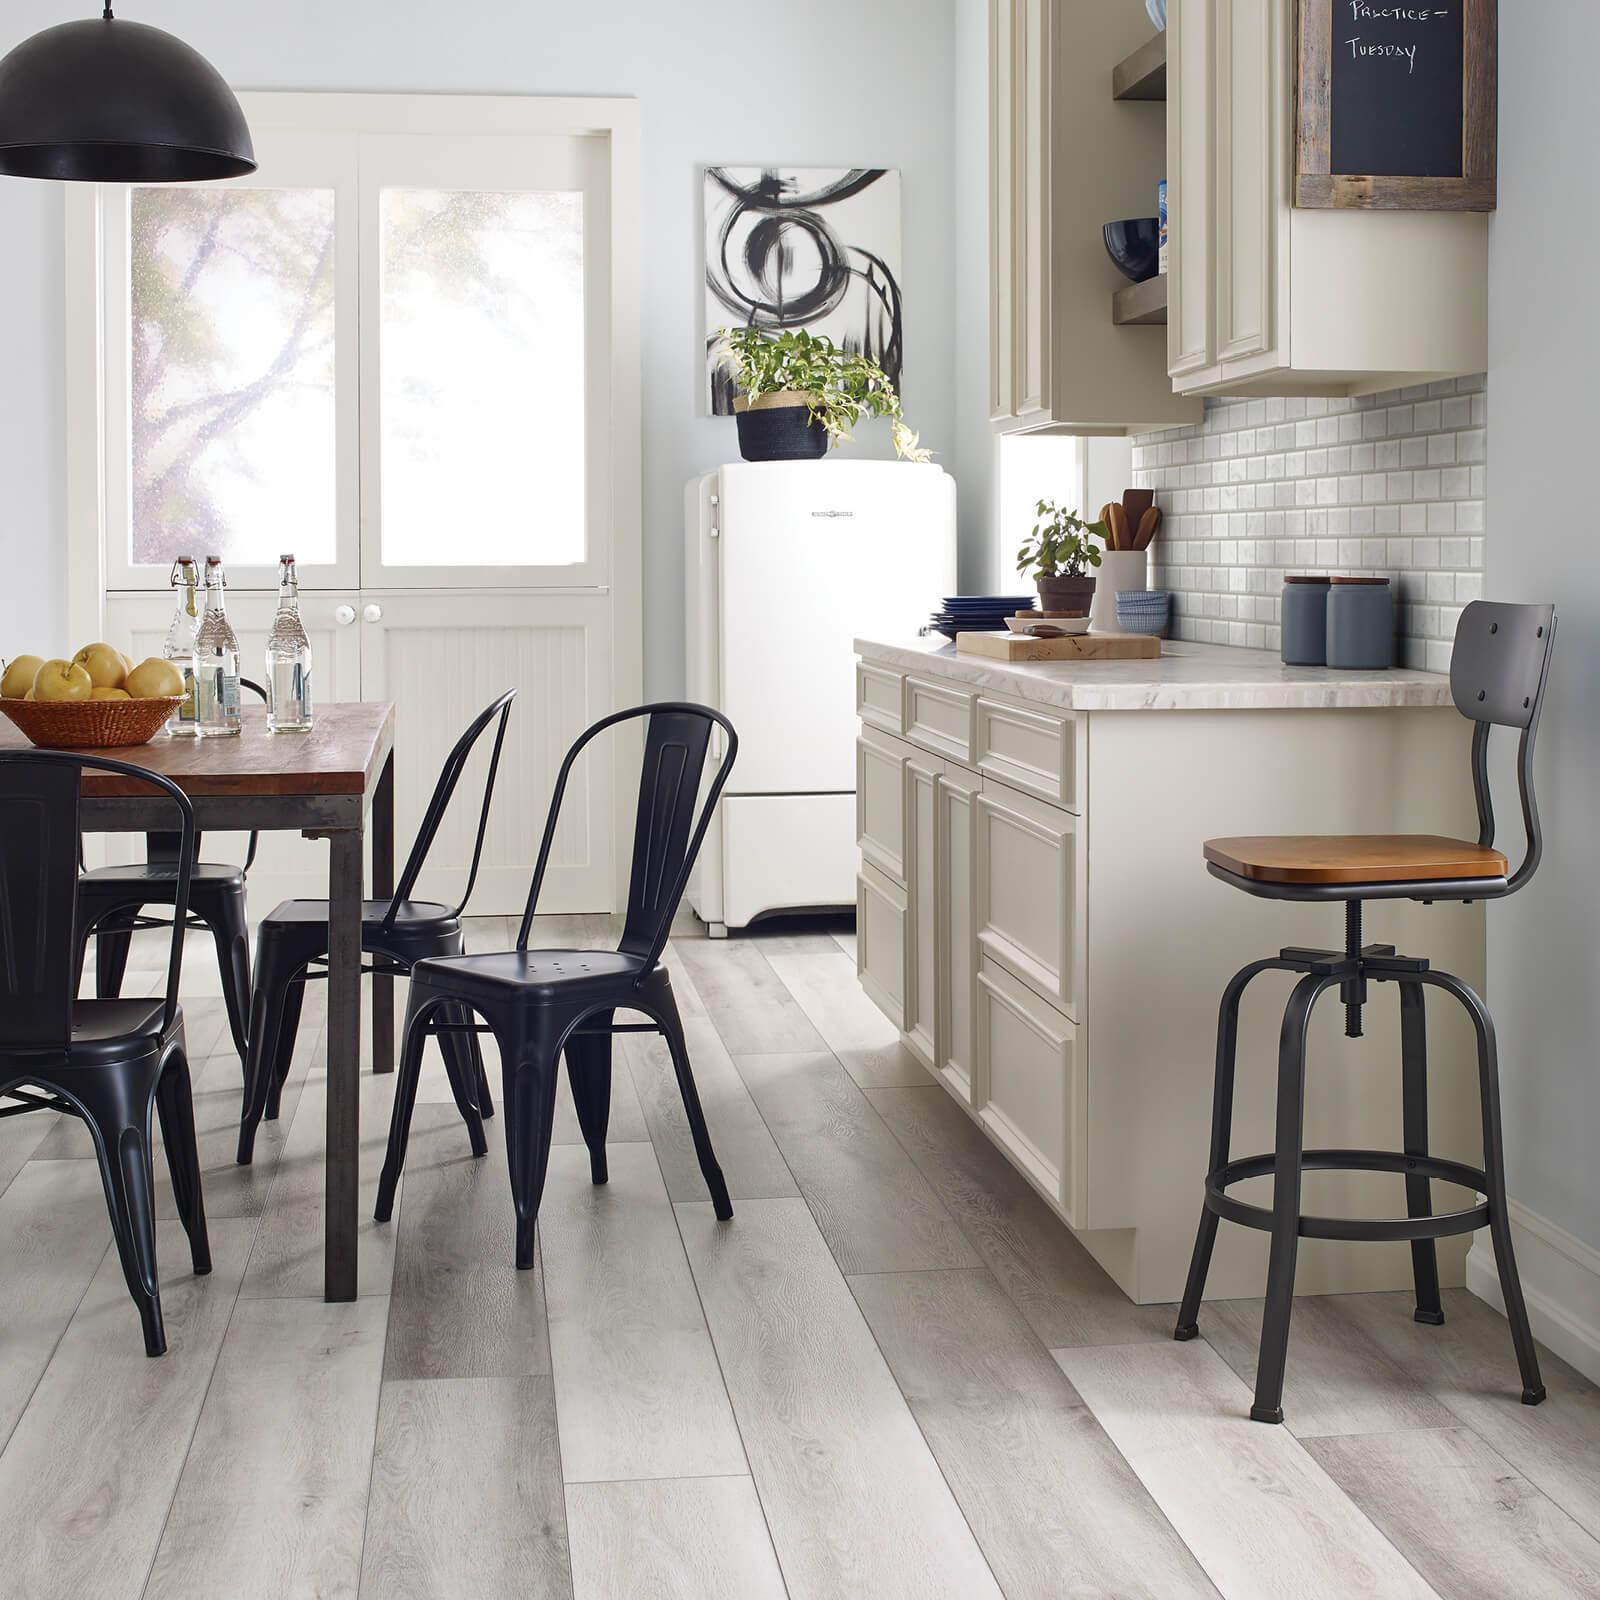 Vinyl Floors in Kitchen | Haley's Flooring & Interiors